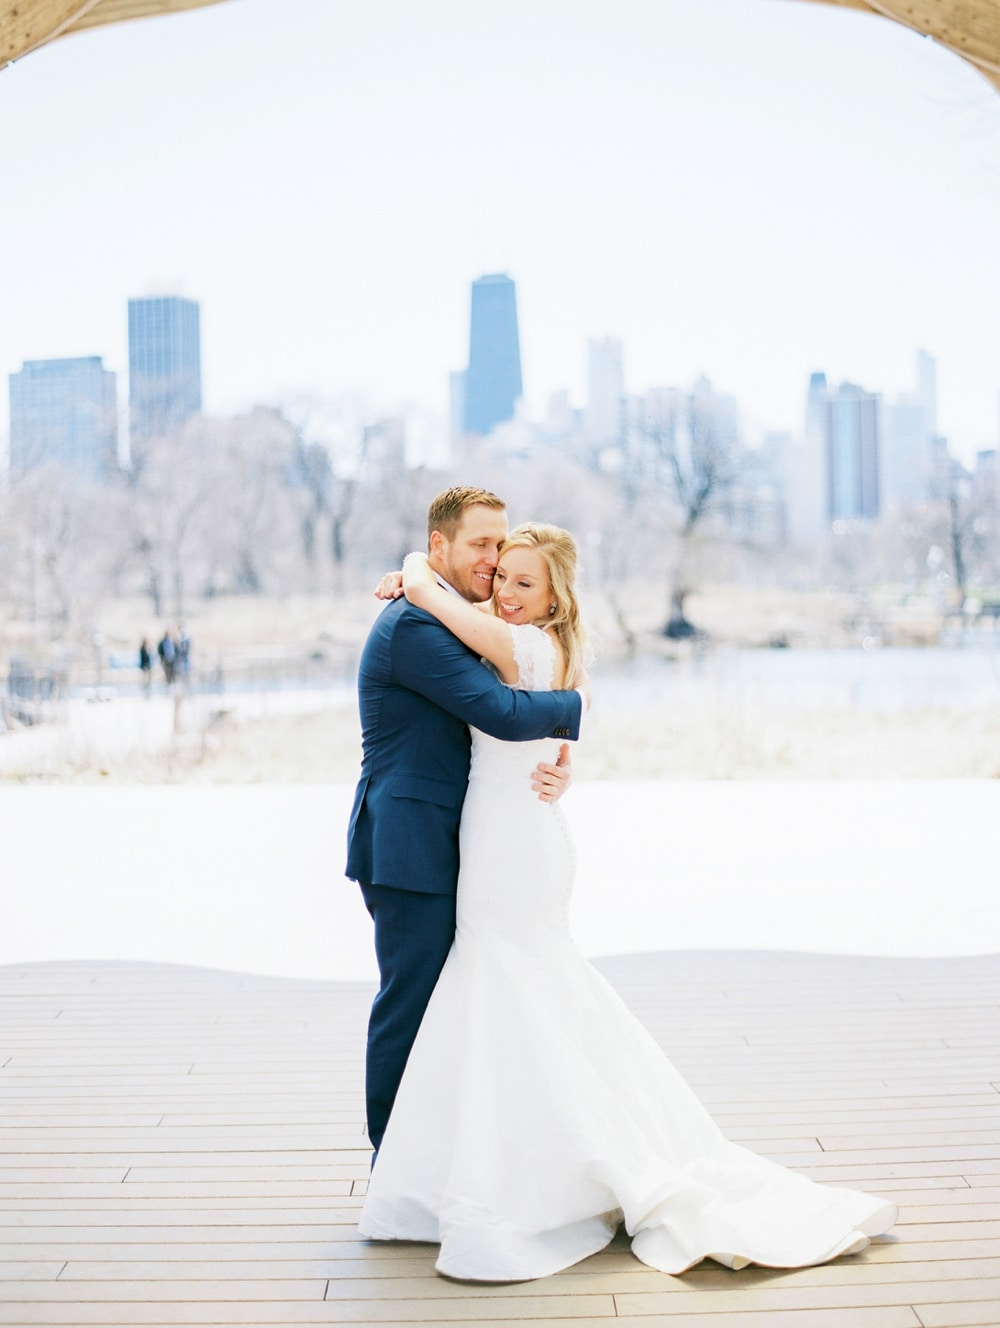 kristin-la-voie-photography-Cafe-Brauer-Chicago-Wedding-Photographer-95